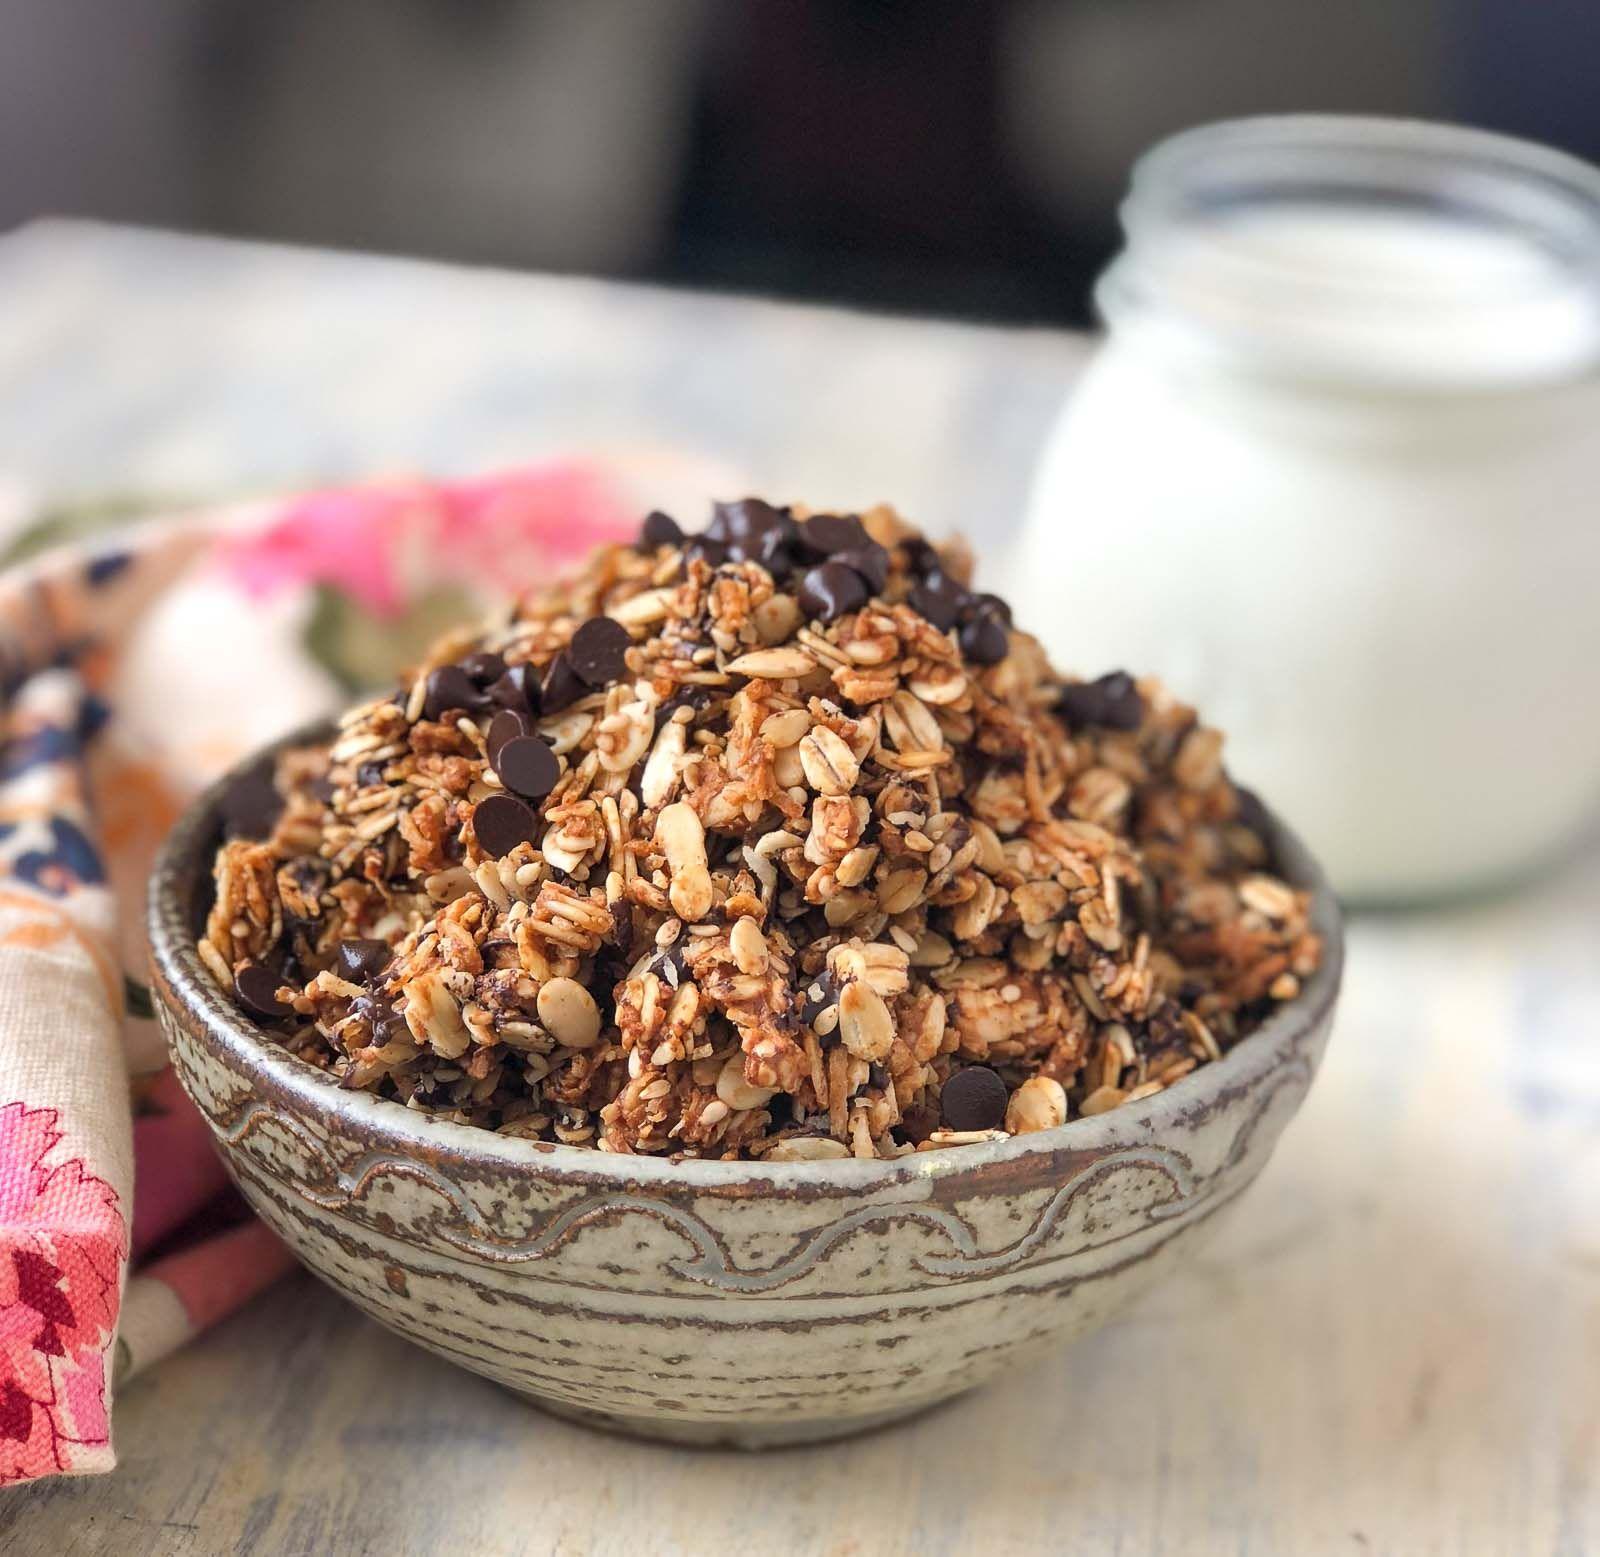 Oats Peanut Butter & Chocolate Chip Trail Mix